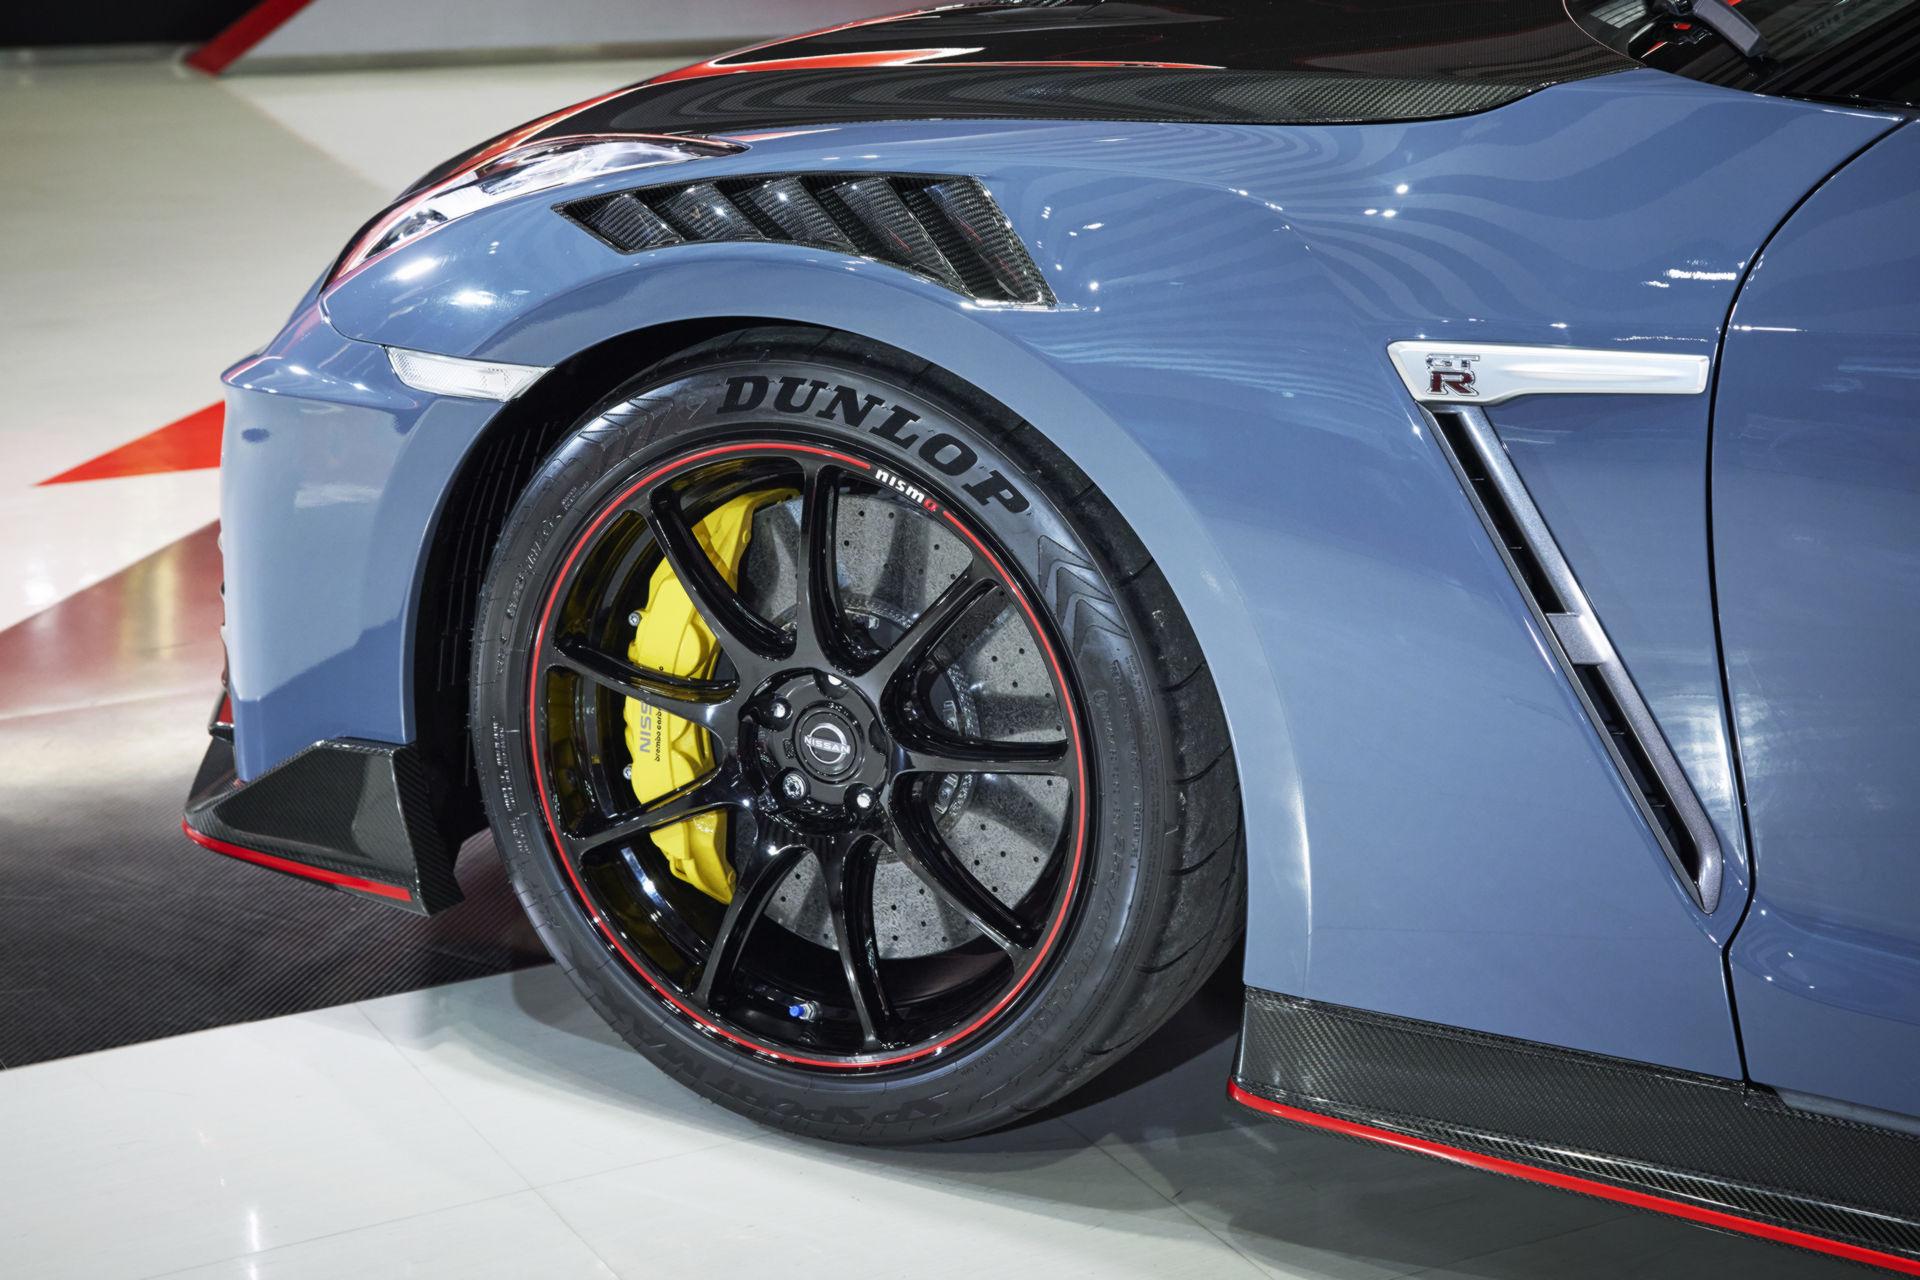 2022-Nissan-GT-R-Nismo-8.jpg